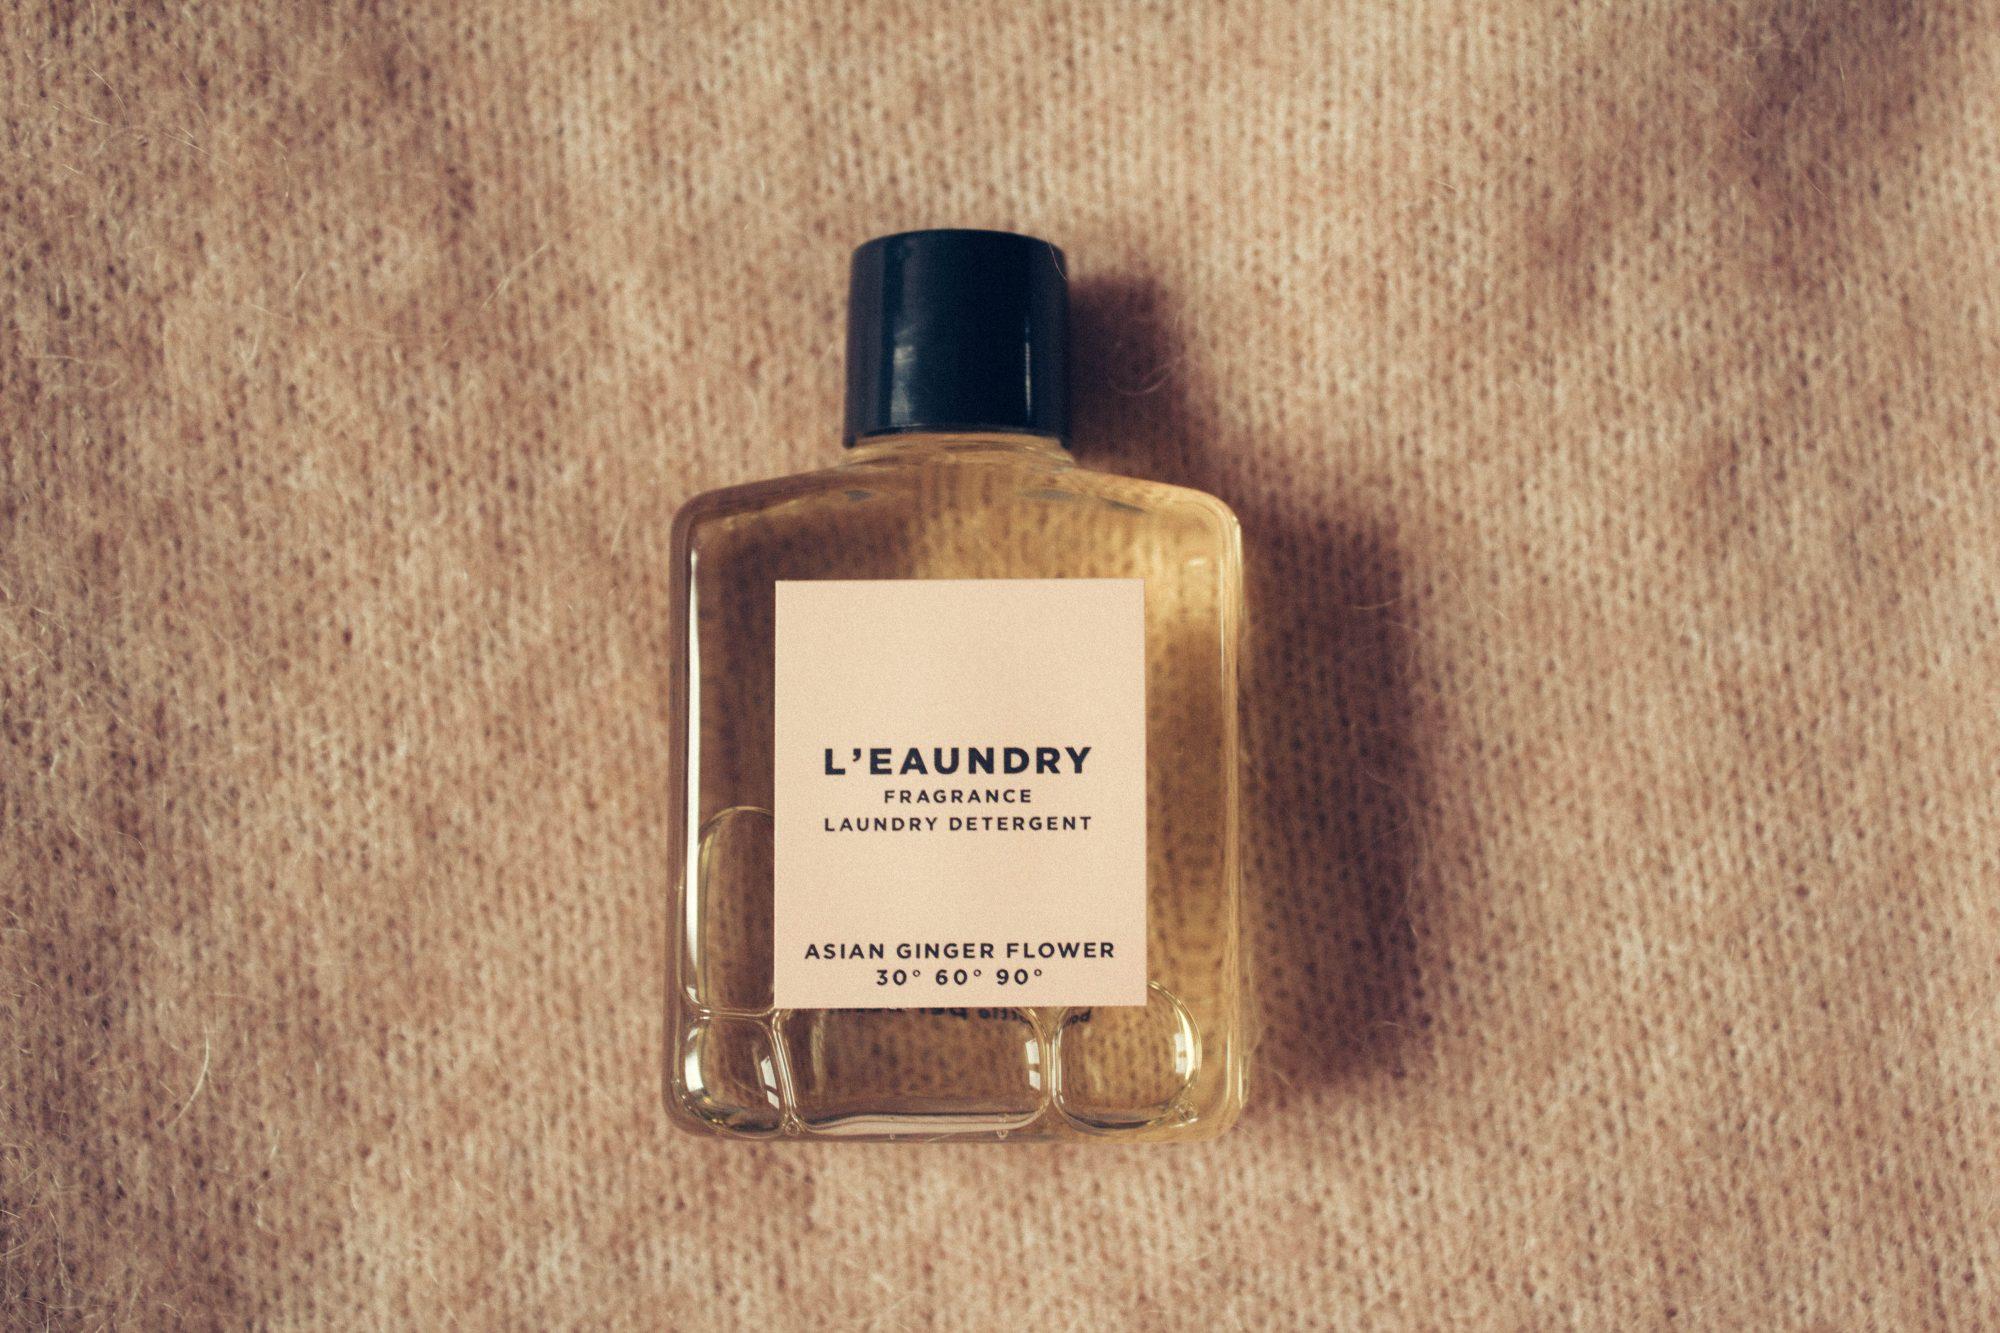 Leaundry LaundryDetergent 4